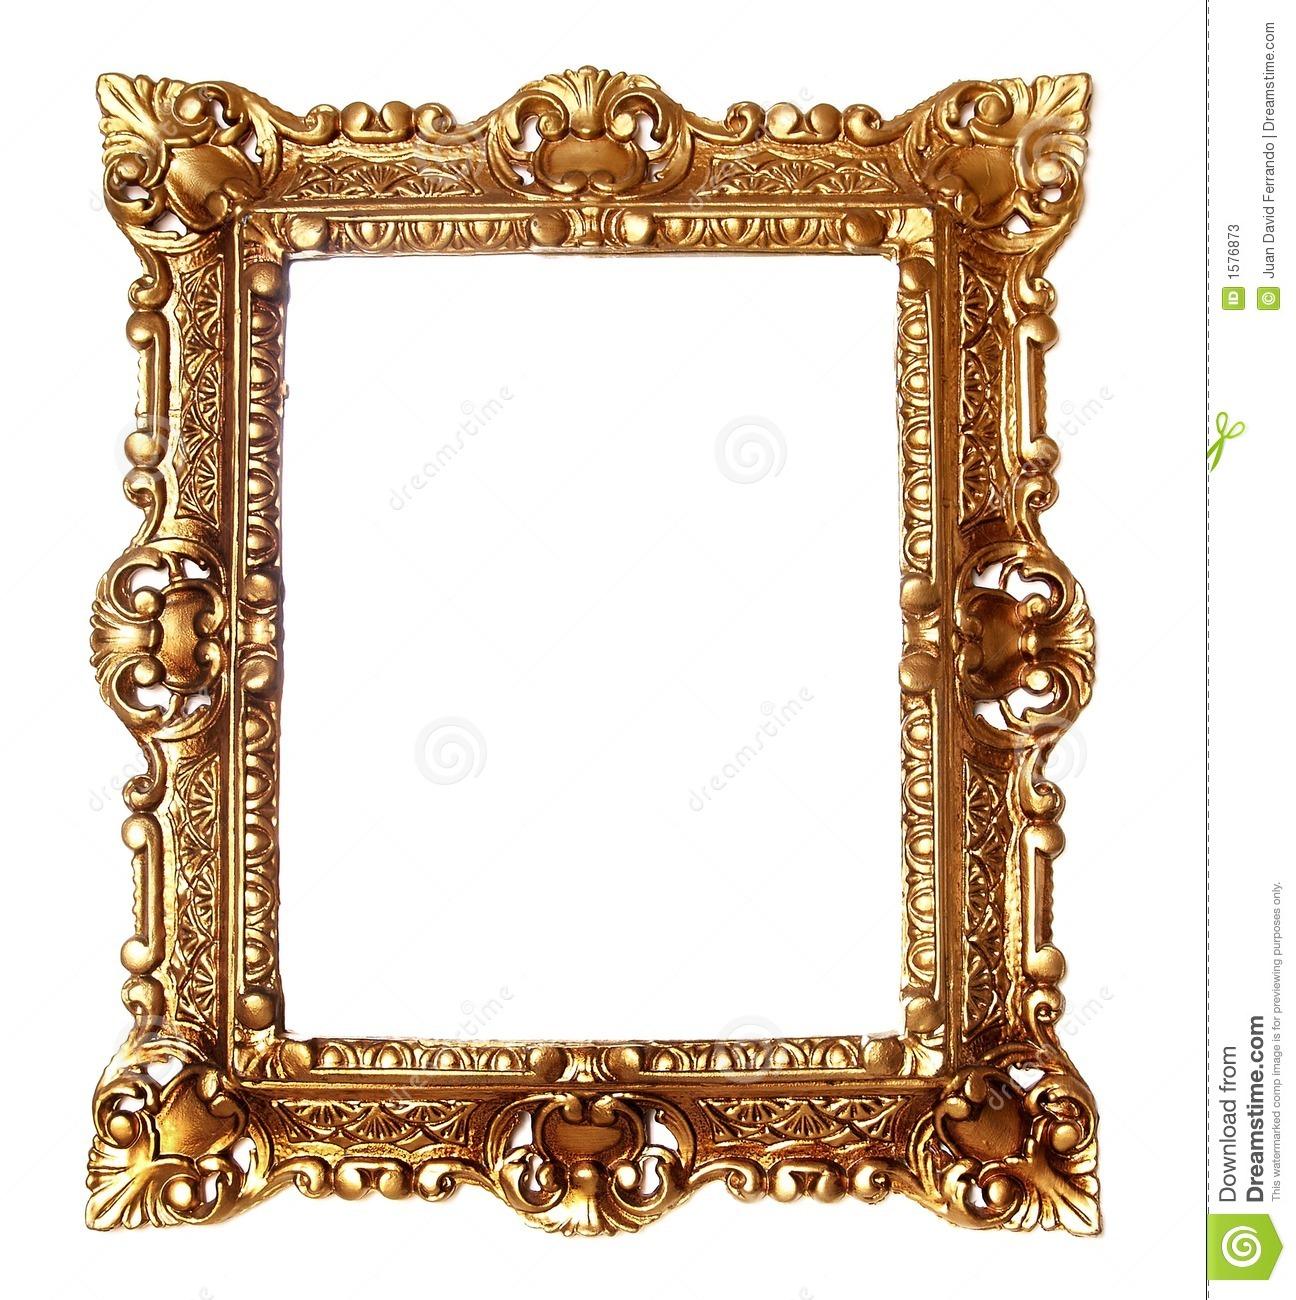 gold frame clip art-gold frame clip art-2